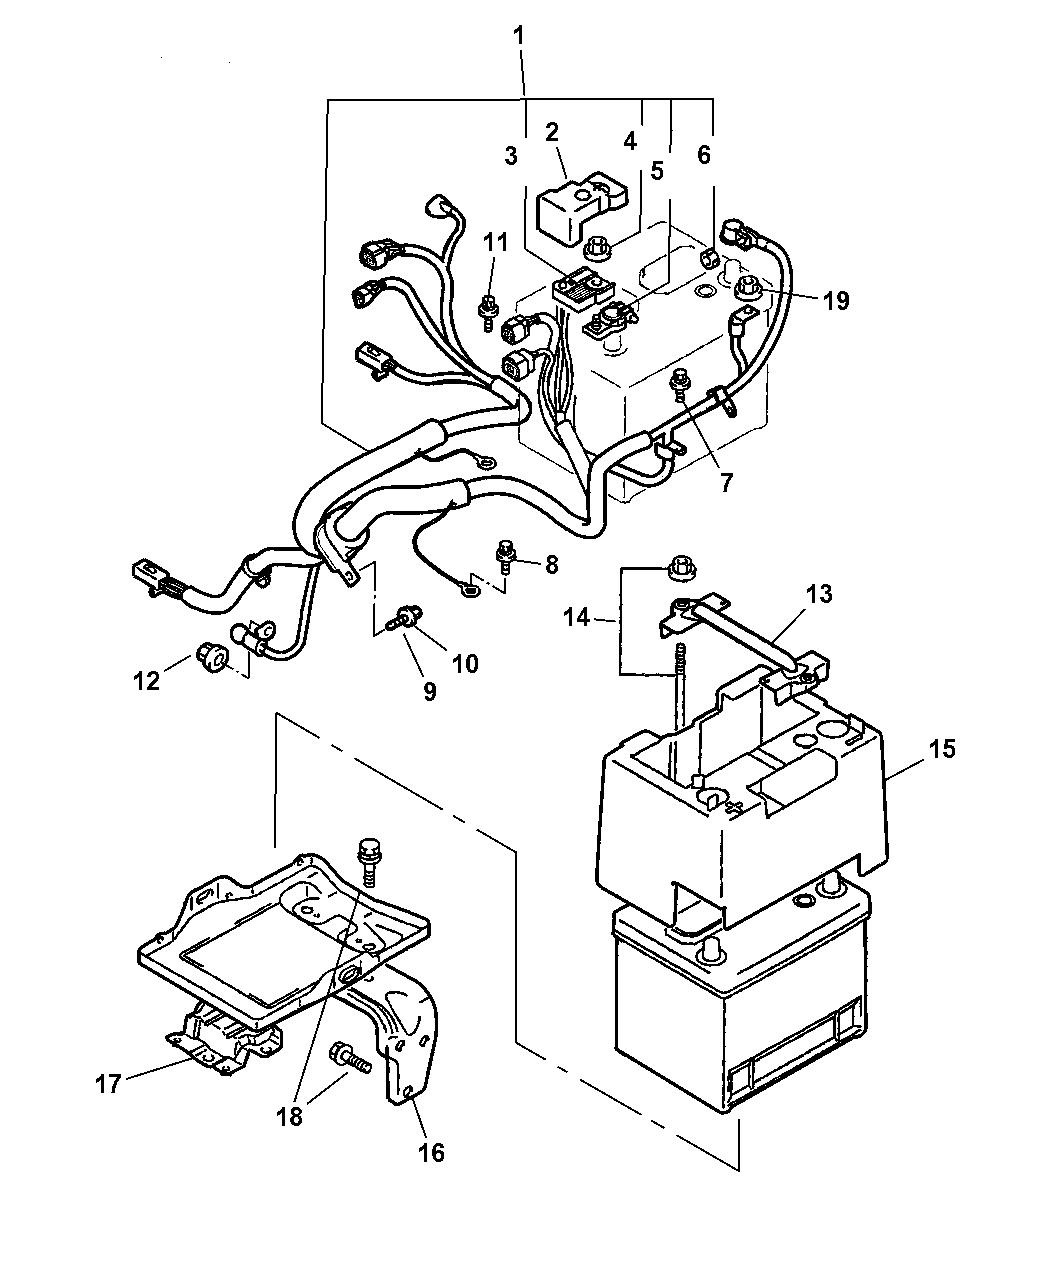 wiring a transformer diagram wiring a bat diagram mr583277 - genuine chrysler cable/bat-battery